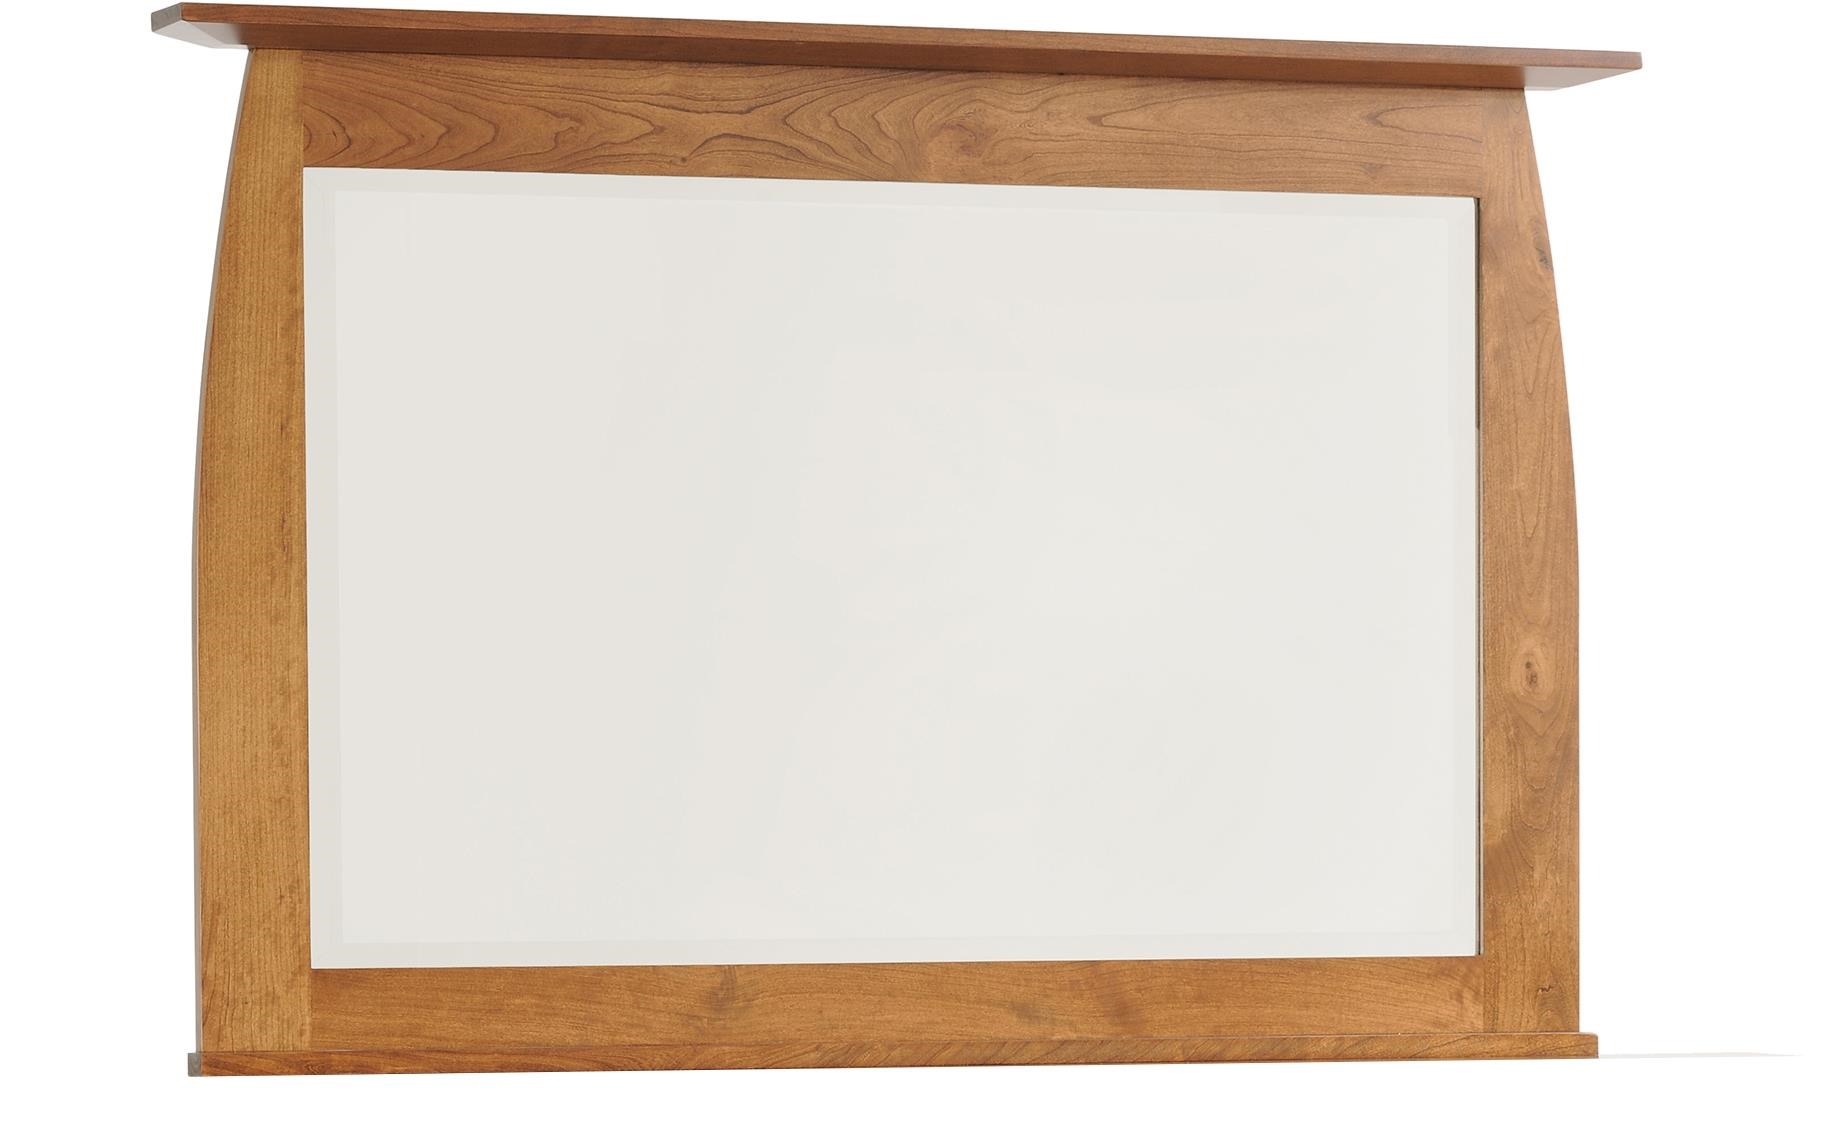 Millcraft Bordeaux Bevel Mirror - Item Number: MFB052MR